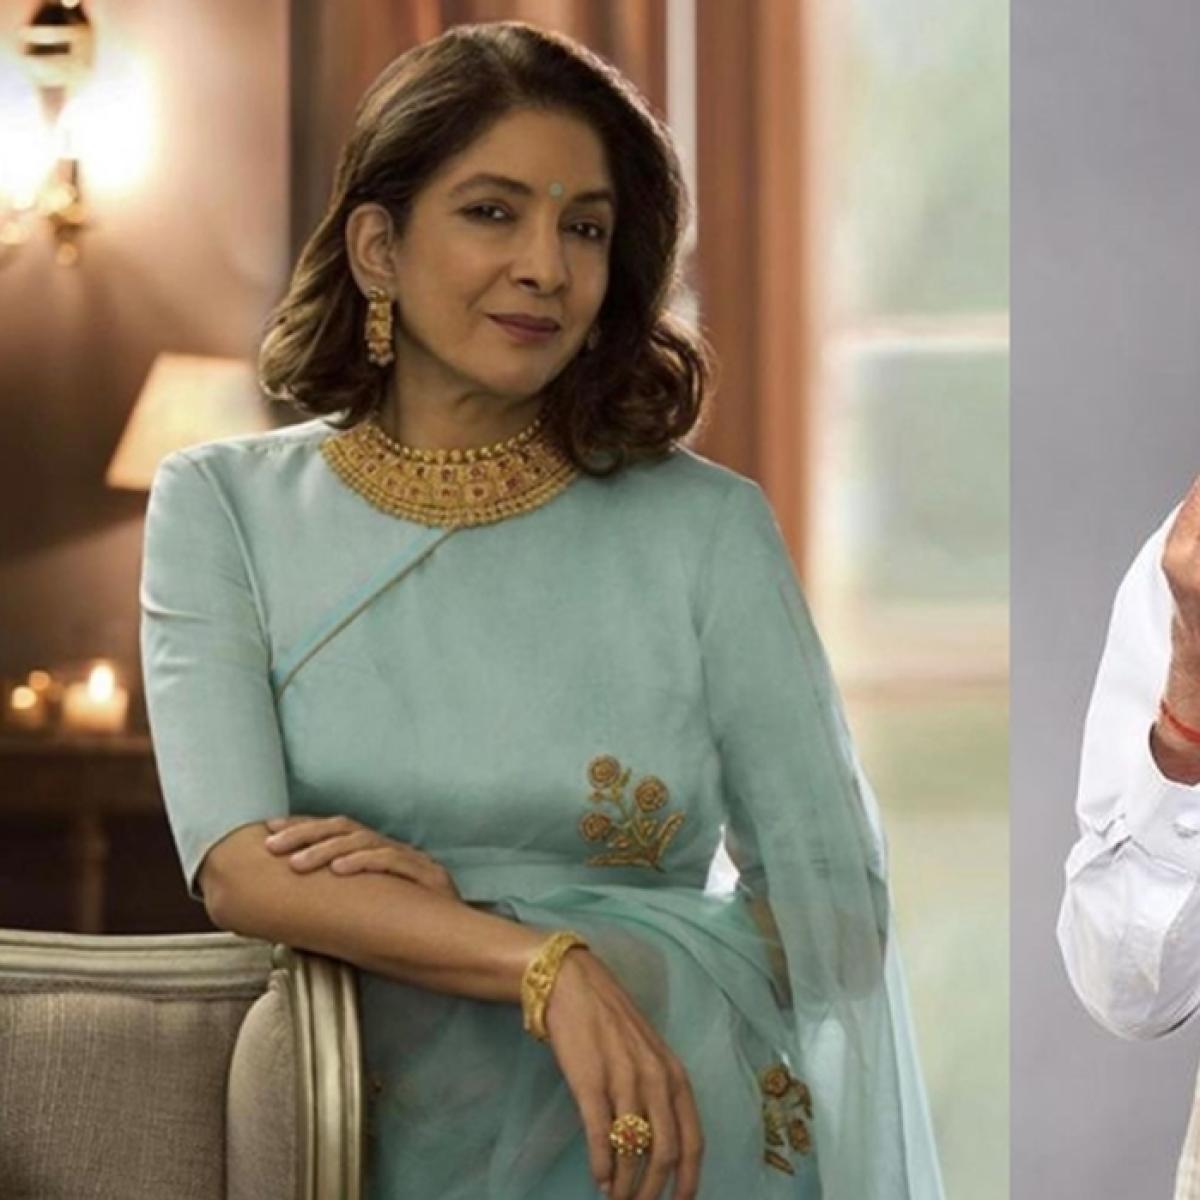 Neena Gupta to play Amitabh Bachchan's wife in Vikas Bahl's 'Goodbye'